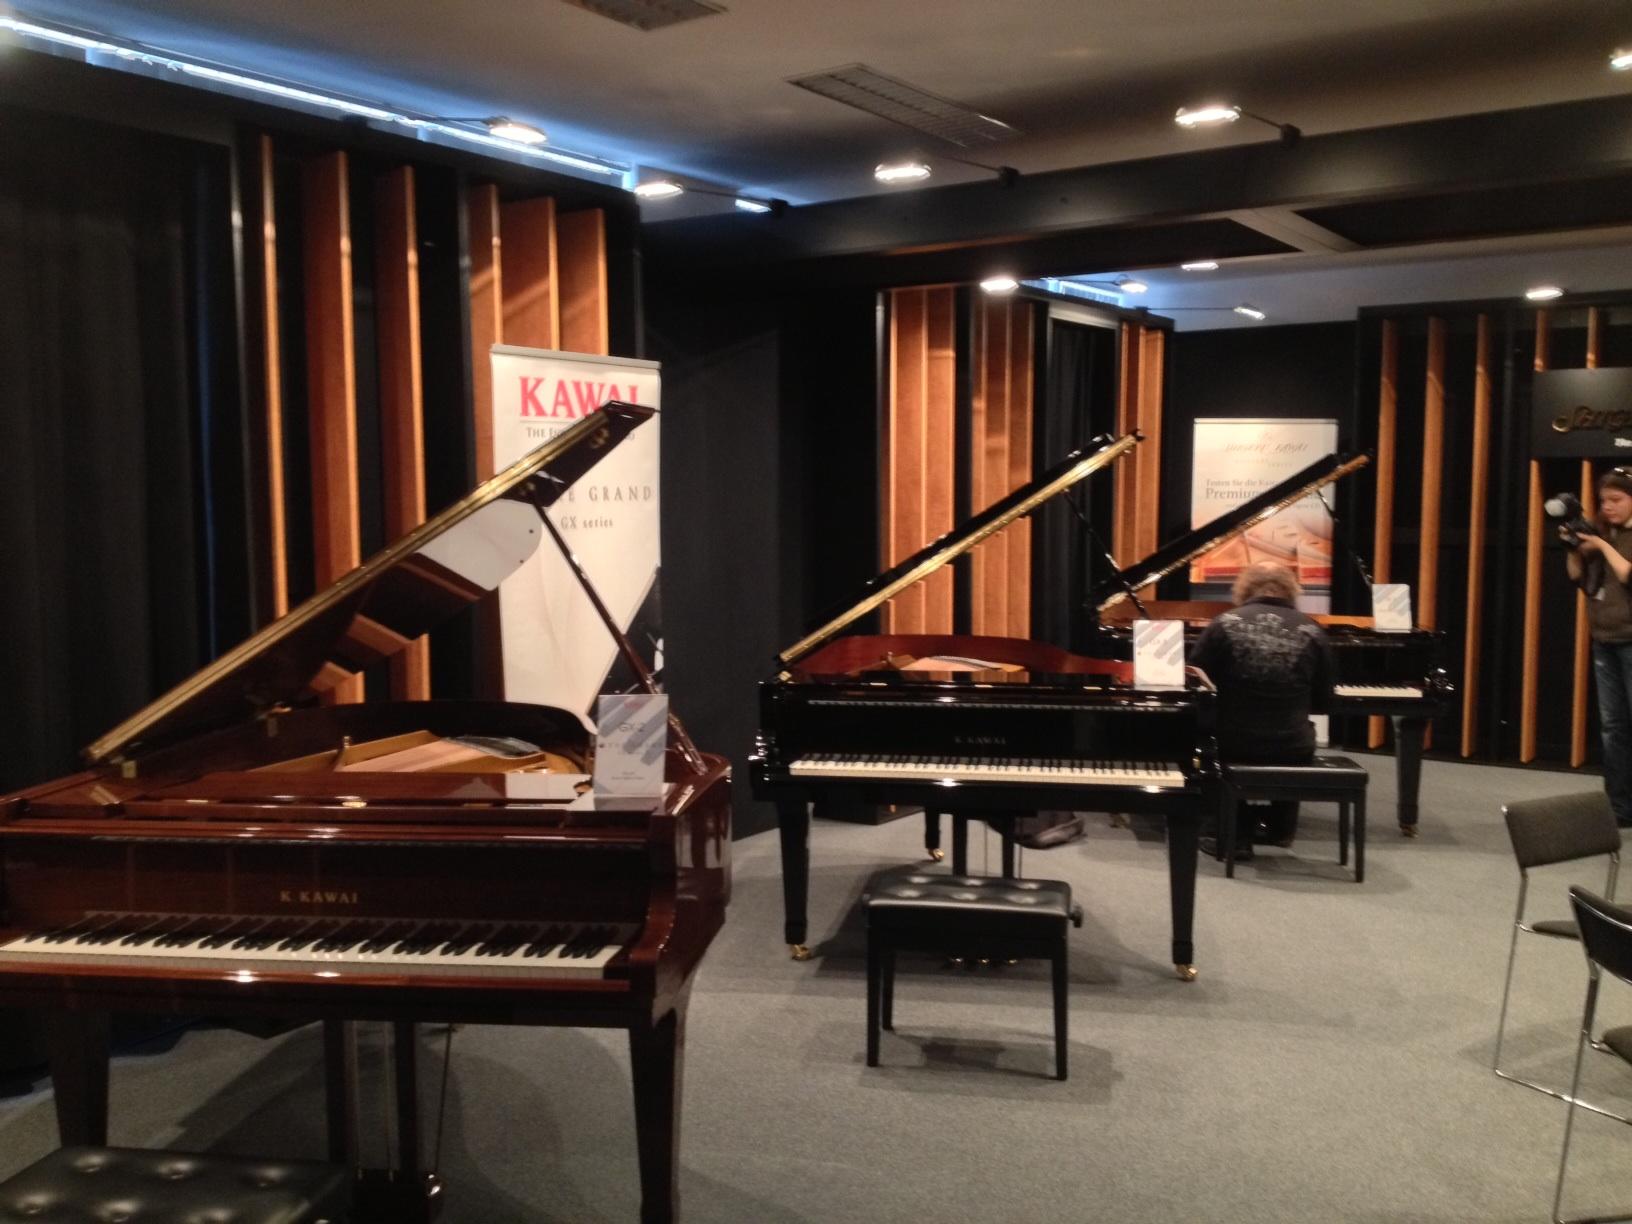 Kawai GX grand pianos